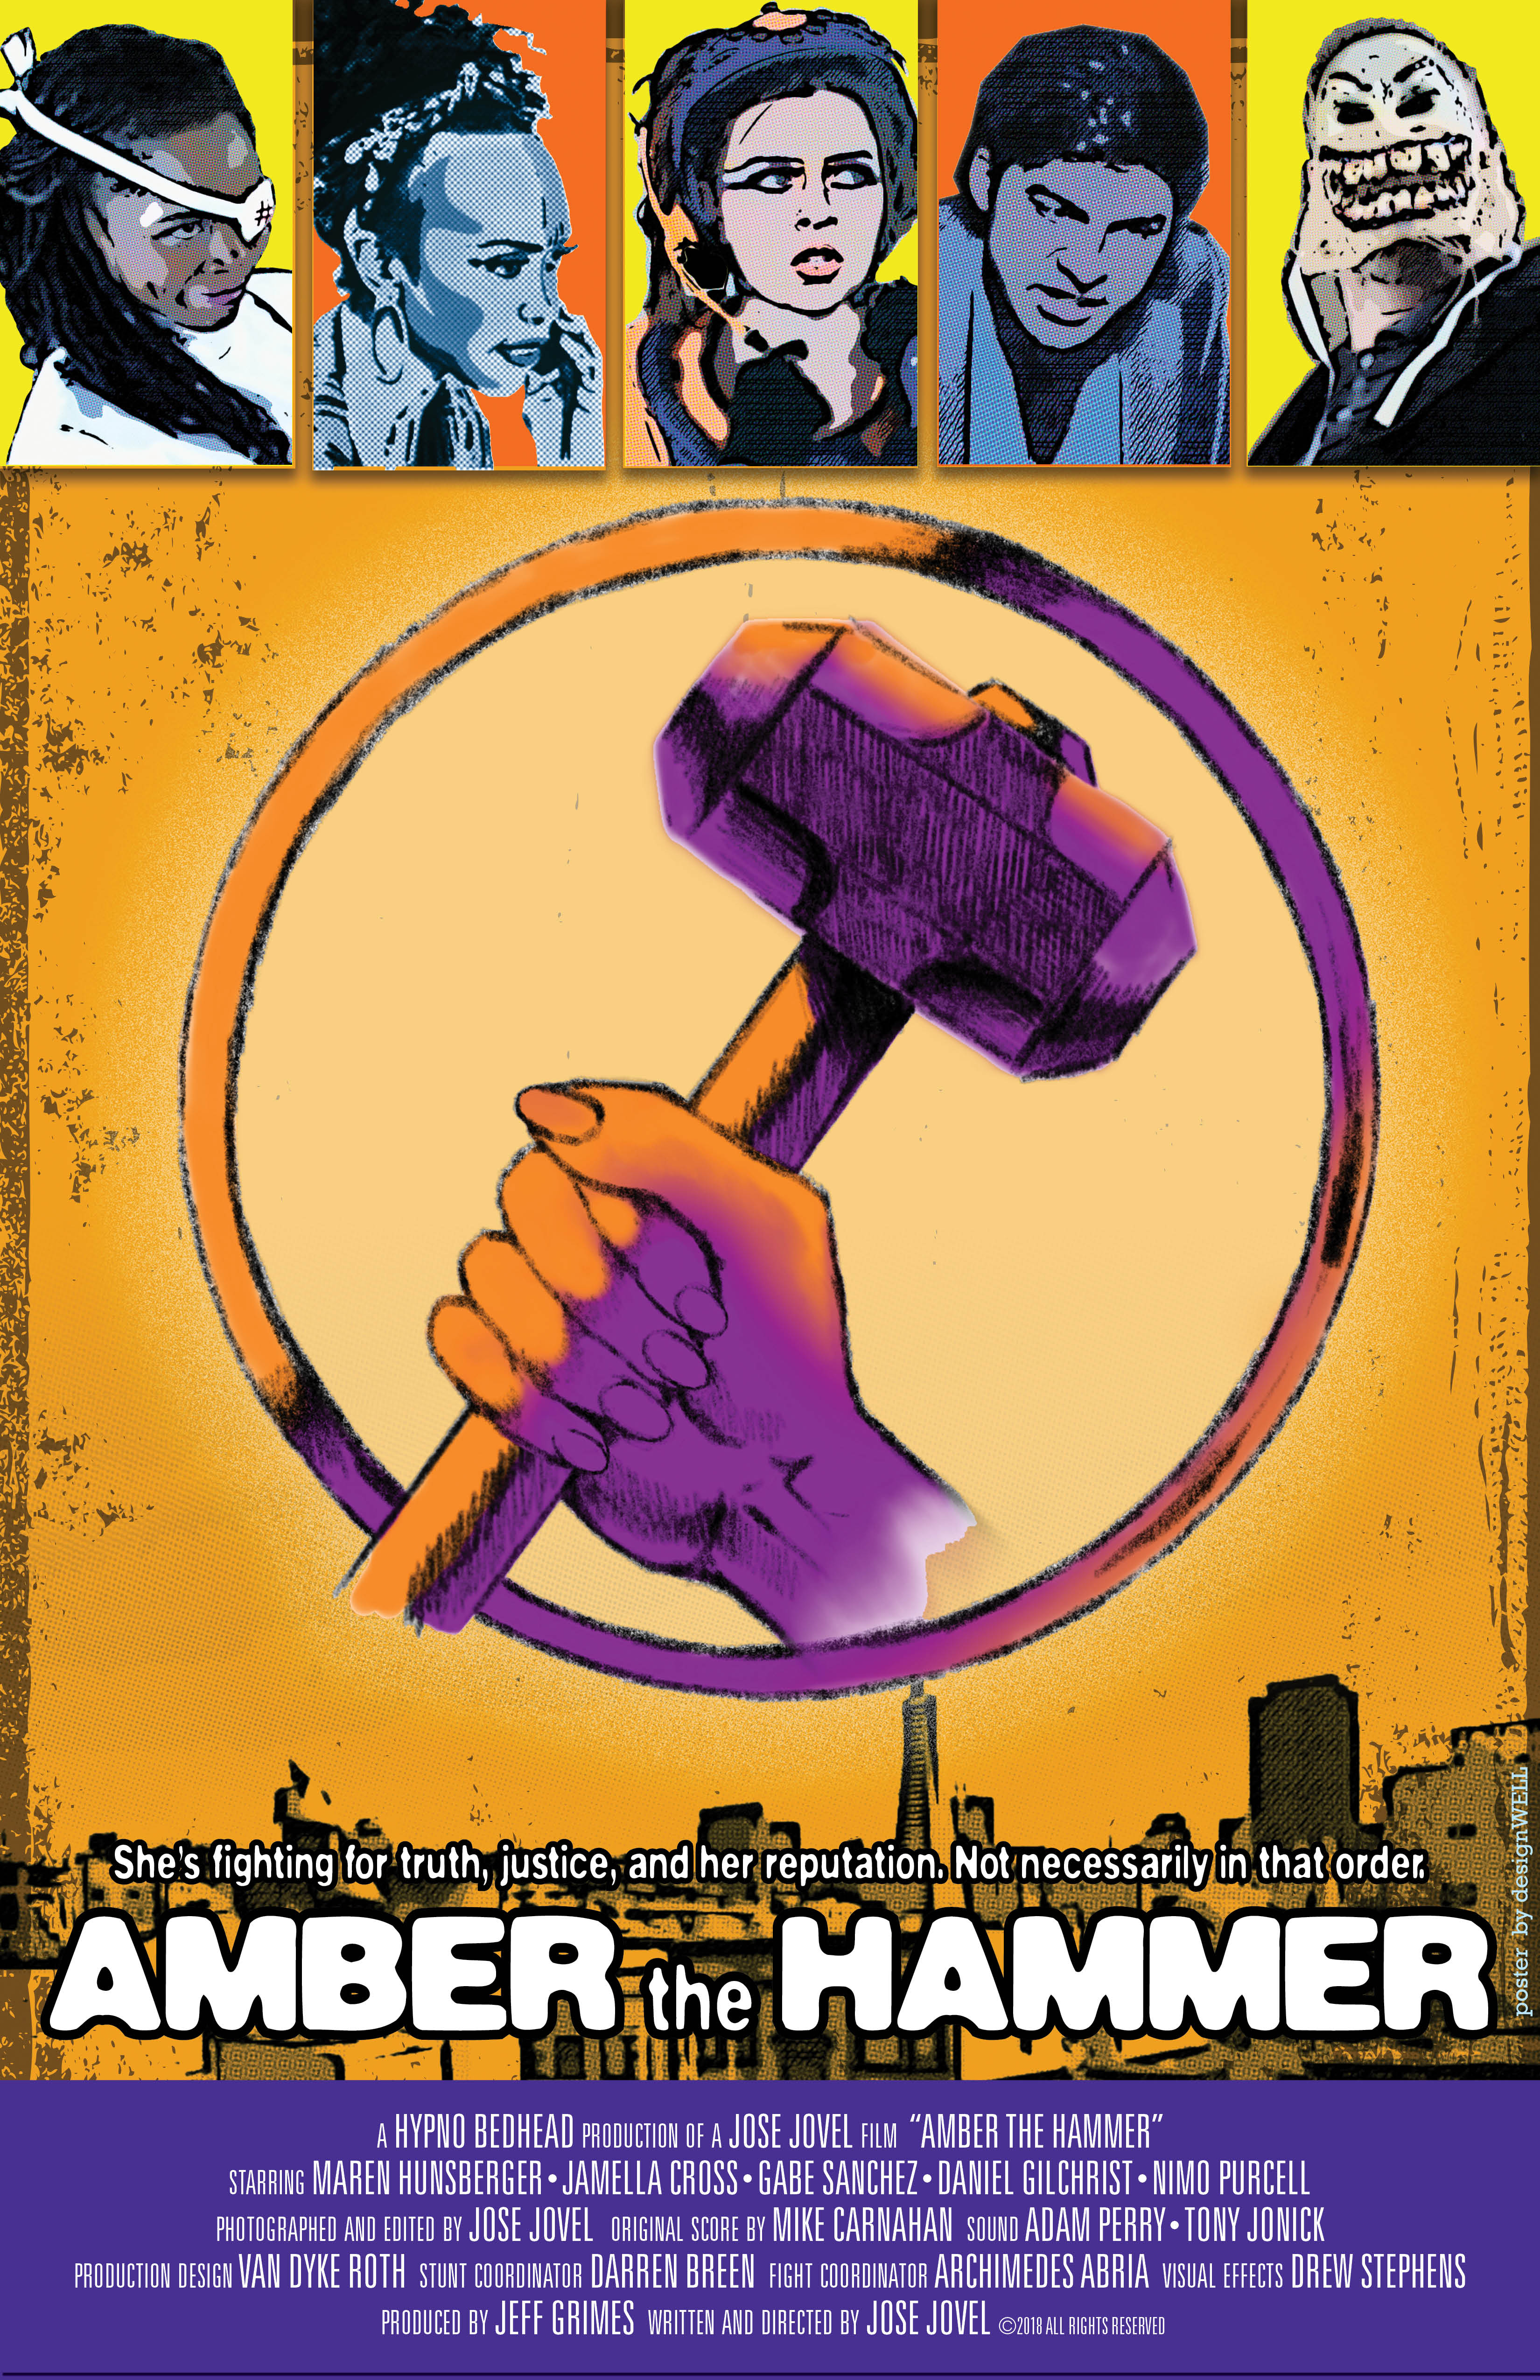 Amber the Hammer